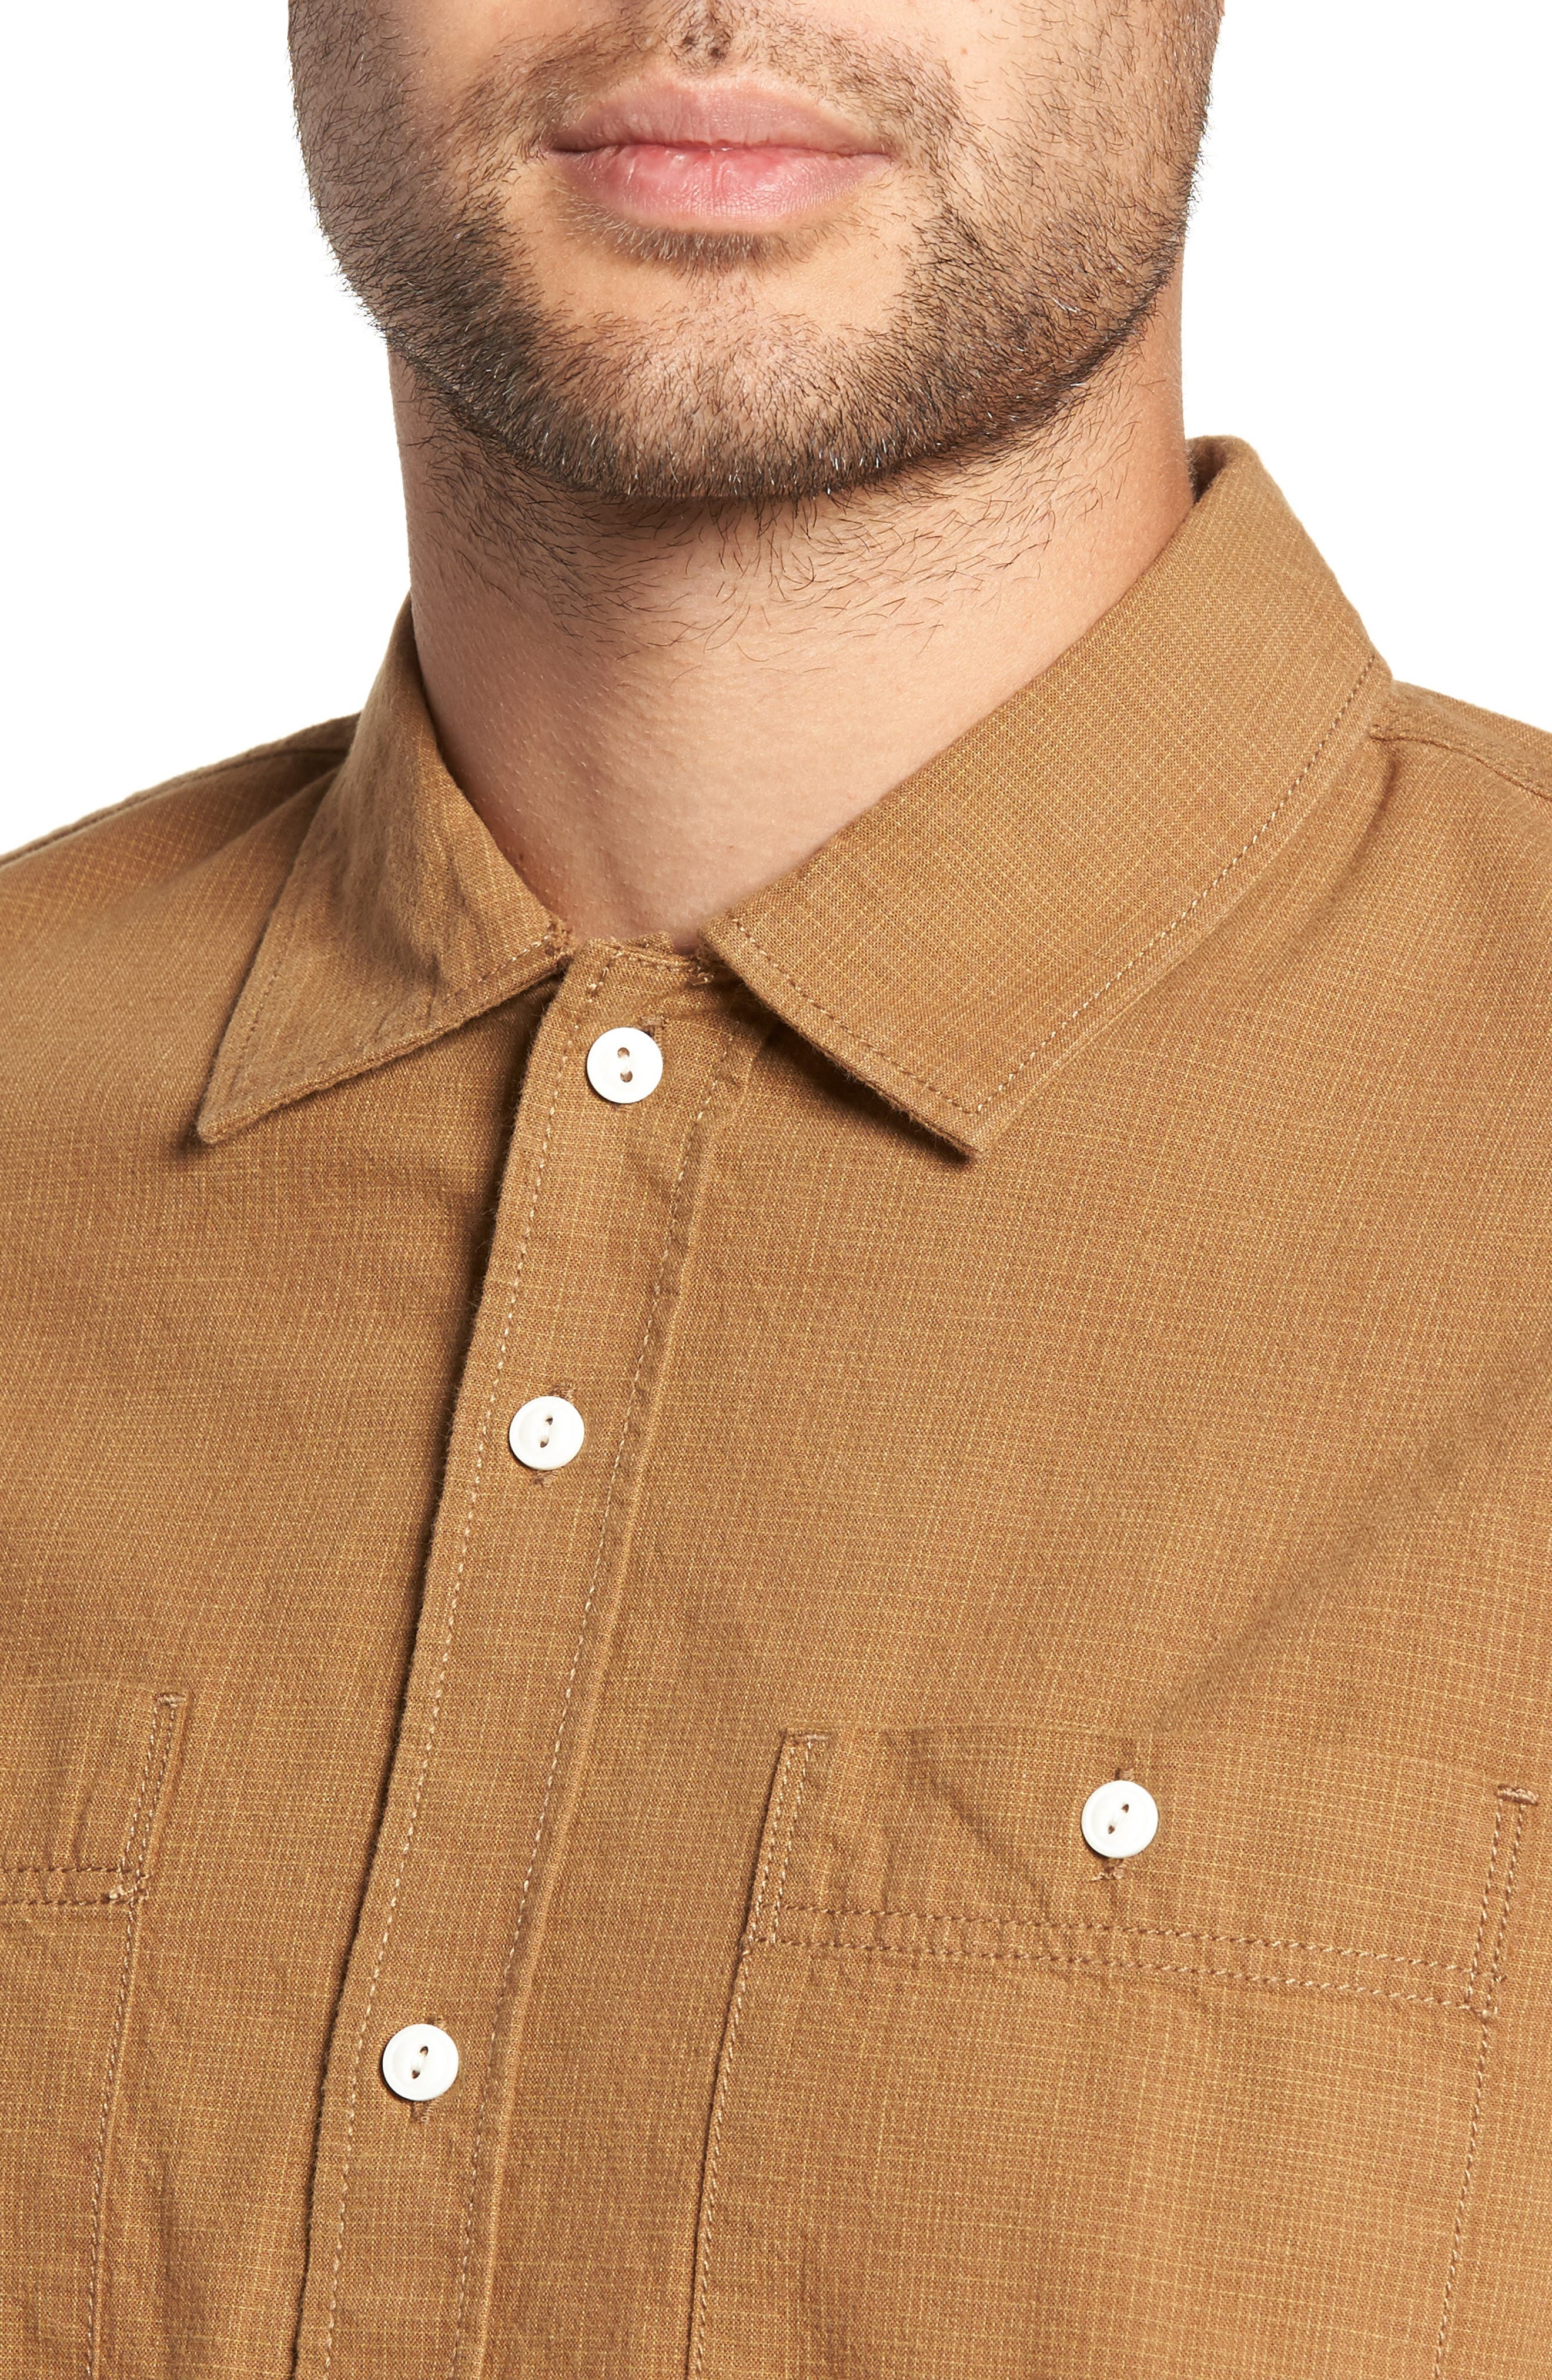 Durhamd Ombré Plaid Sport Shirt,                             Alternate thumbnail 2, color,                             DIRT